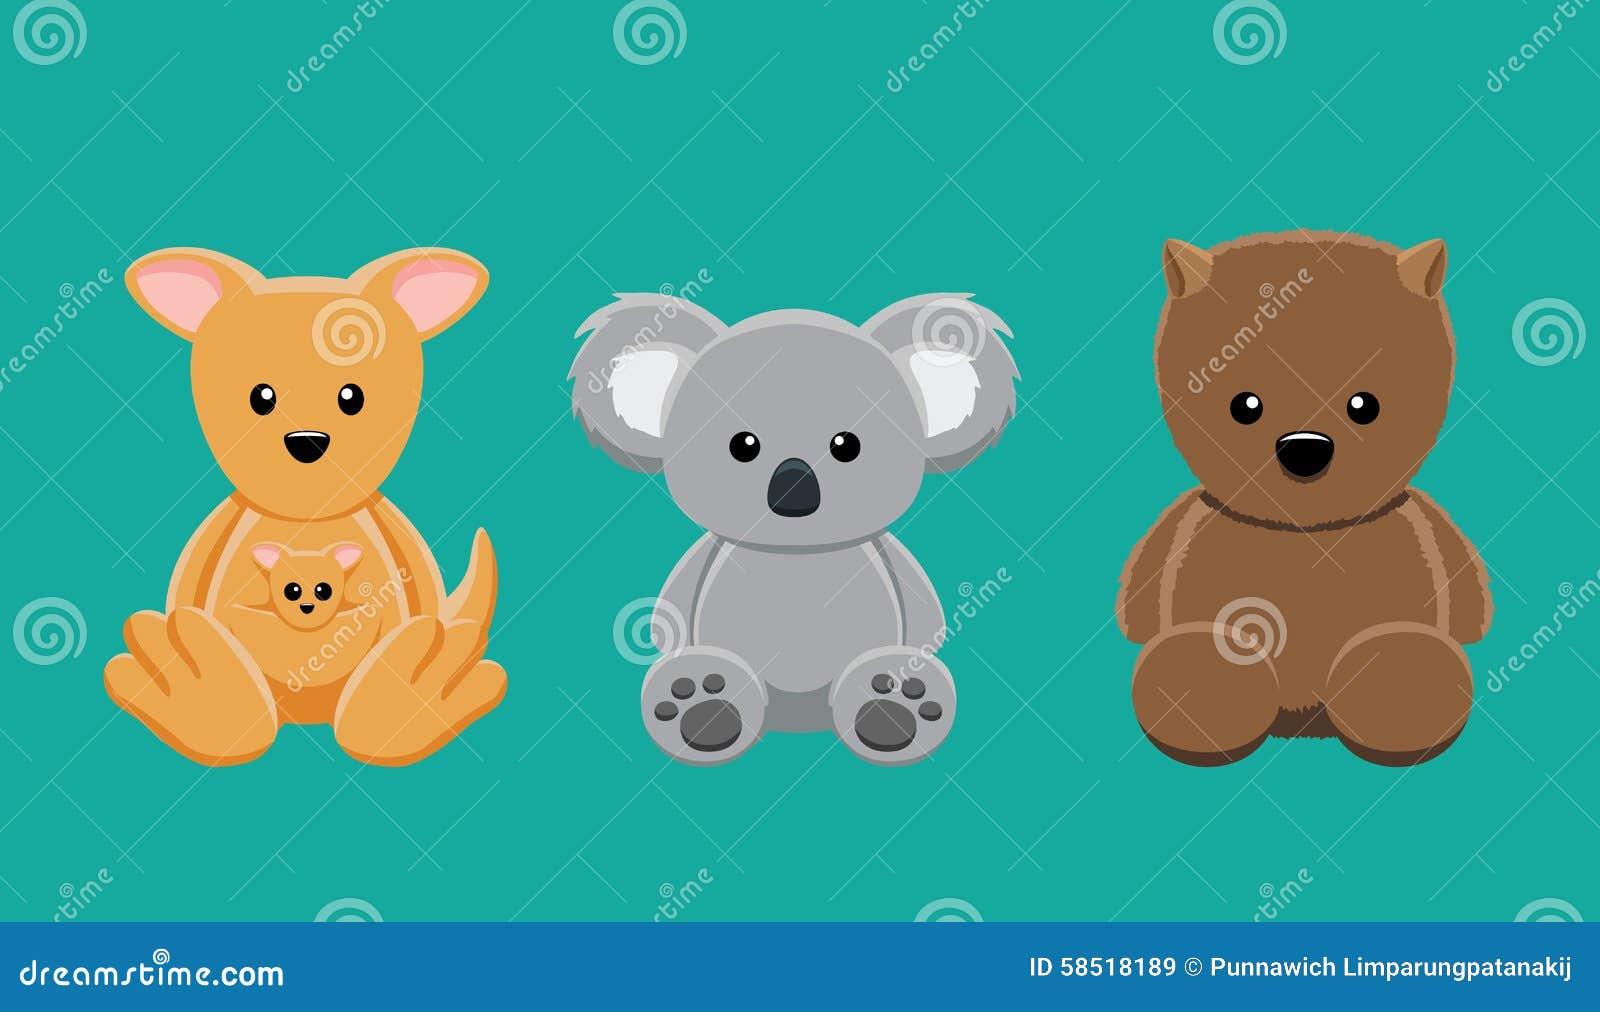 Good Wallpaper Koala Cartoon - kangaroo-koala-wombat-doll-set-cartoon-vector-illustration-cute-animal-dolls-collection-eps-file-format-58518189  Gallery_30516   .jpg